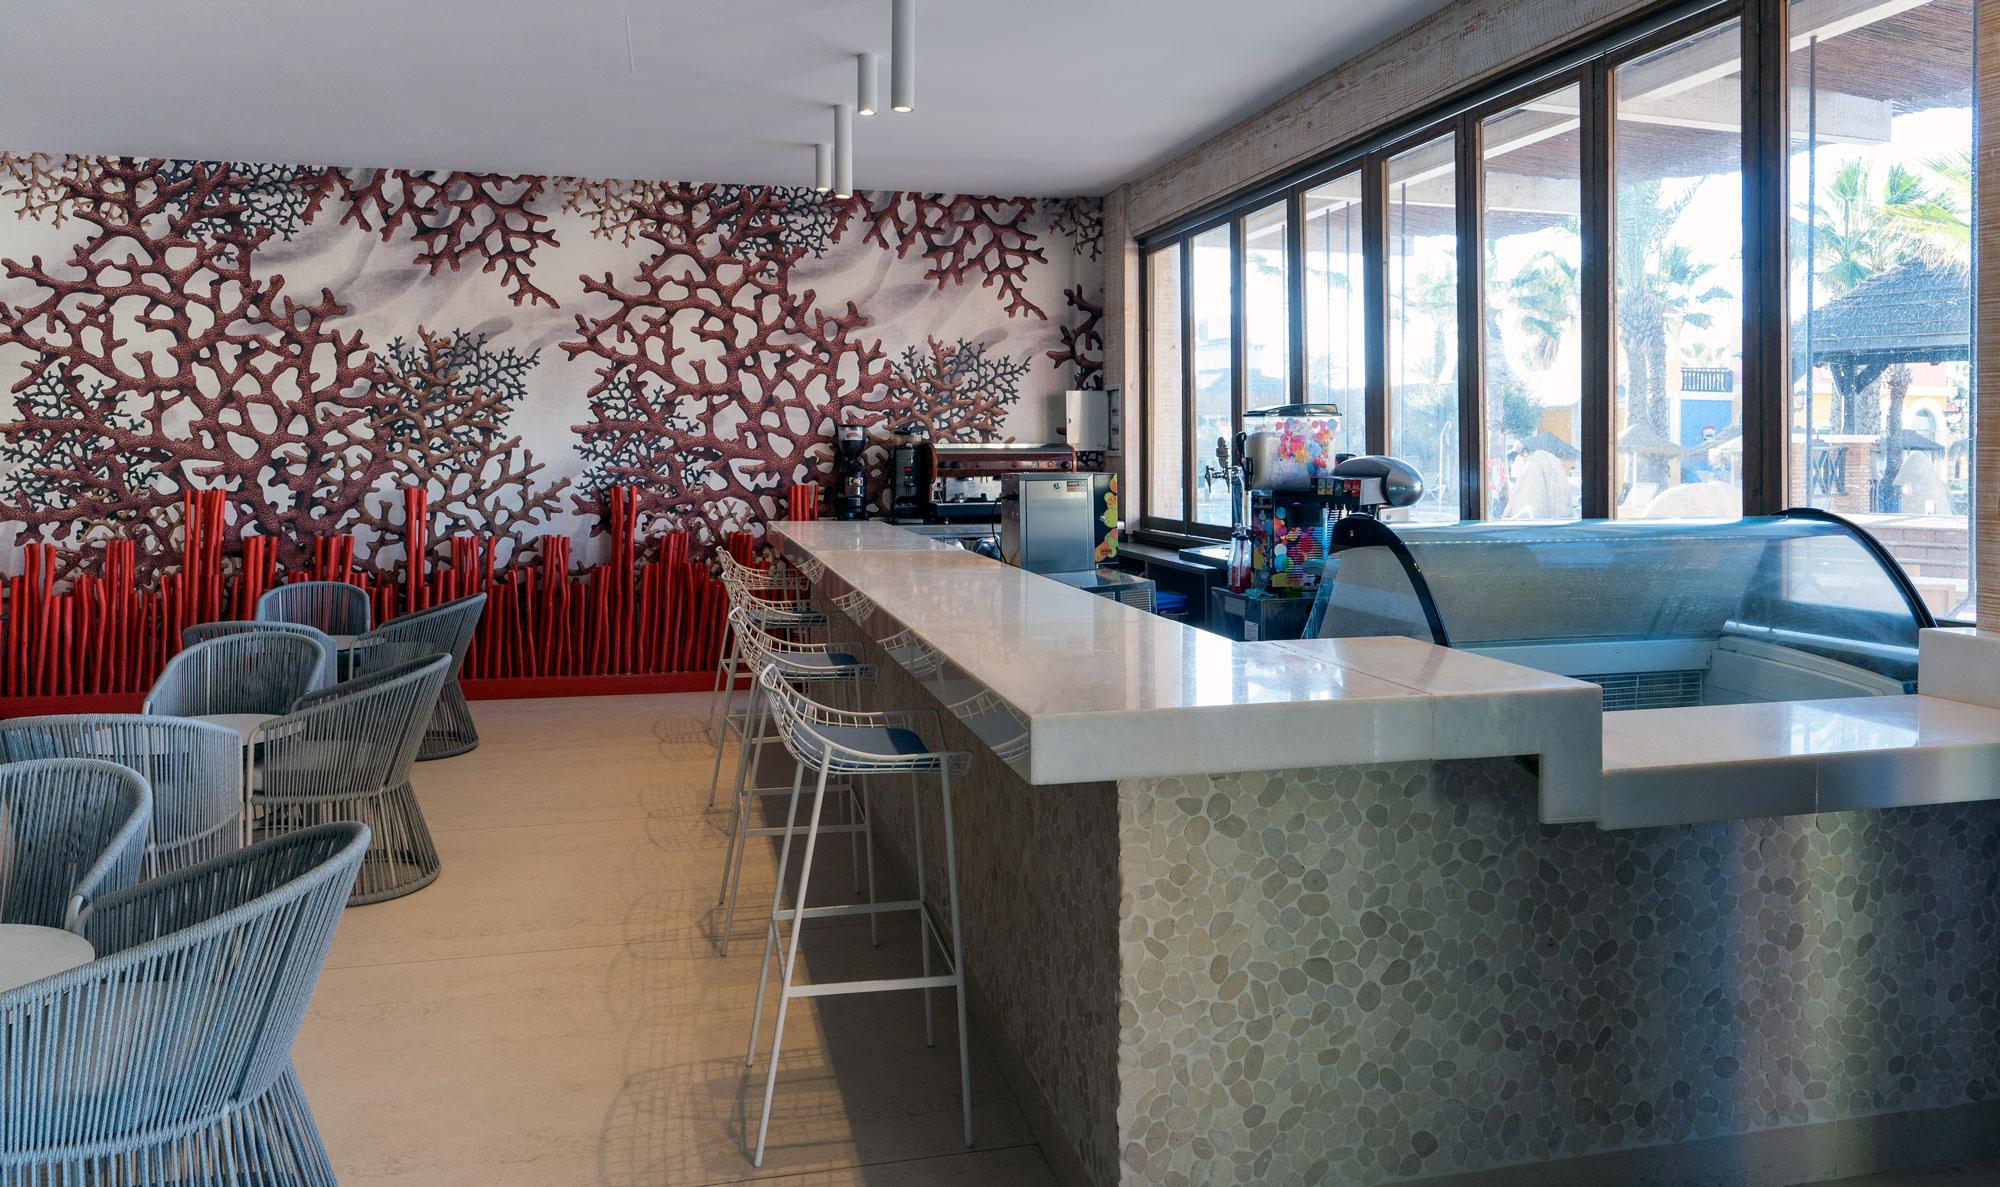 Hotel Mediterráneo  - Hotel Mediterraneo Park 11 Dekton Silestone Piedra Natural Cosentino 64